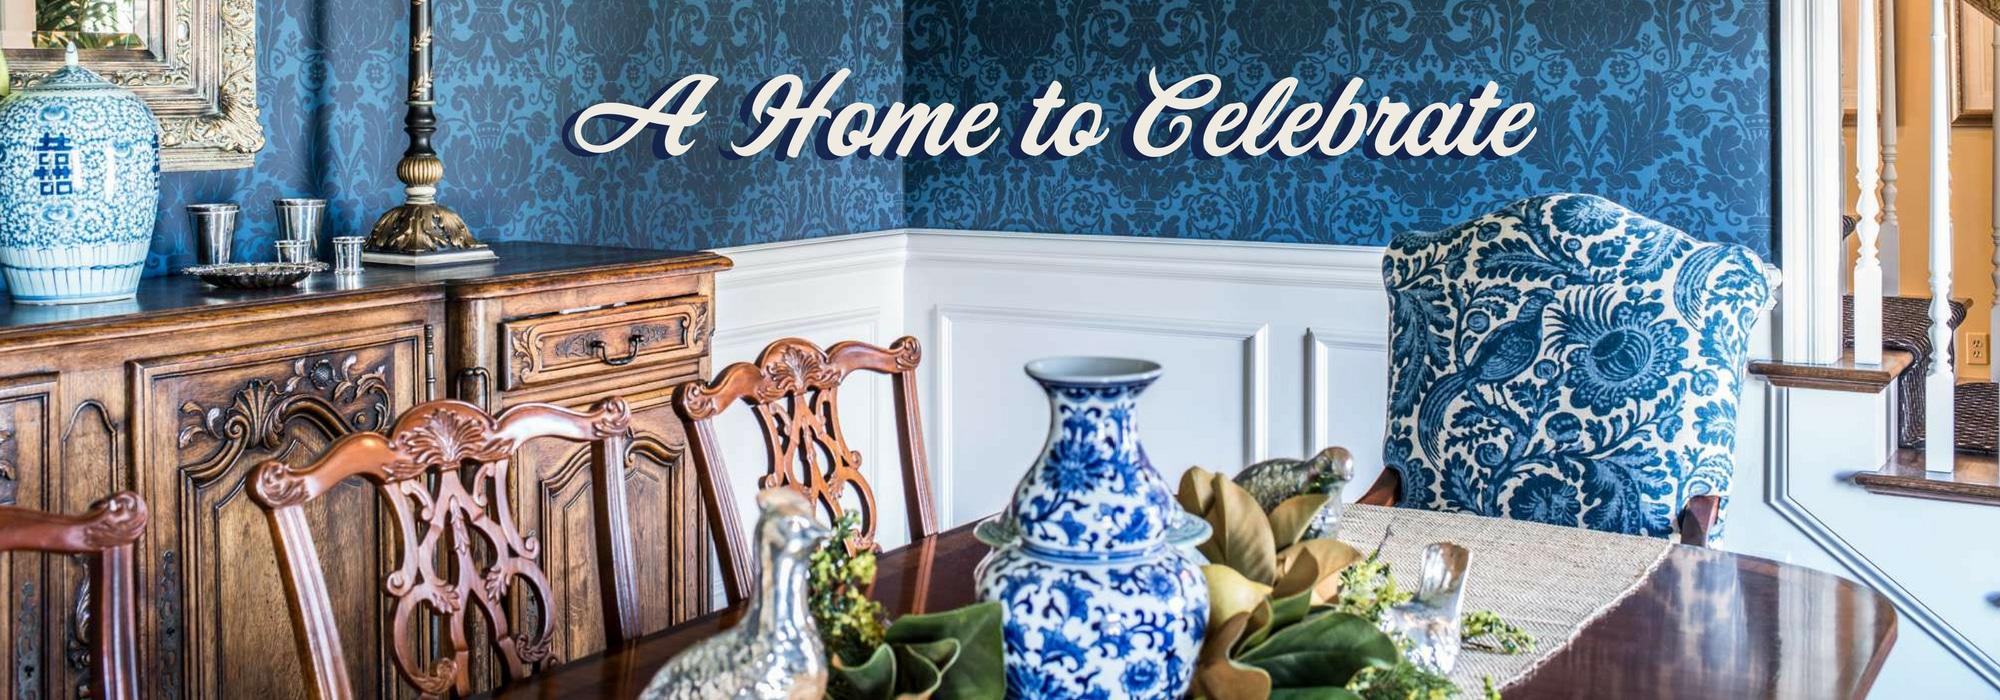 A Home to Celebrate-min.jpg